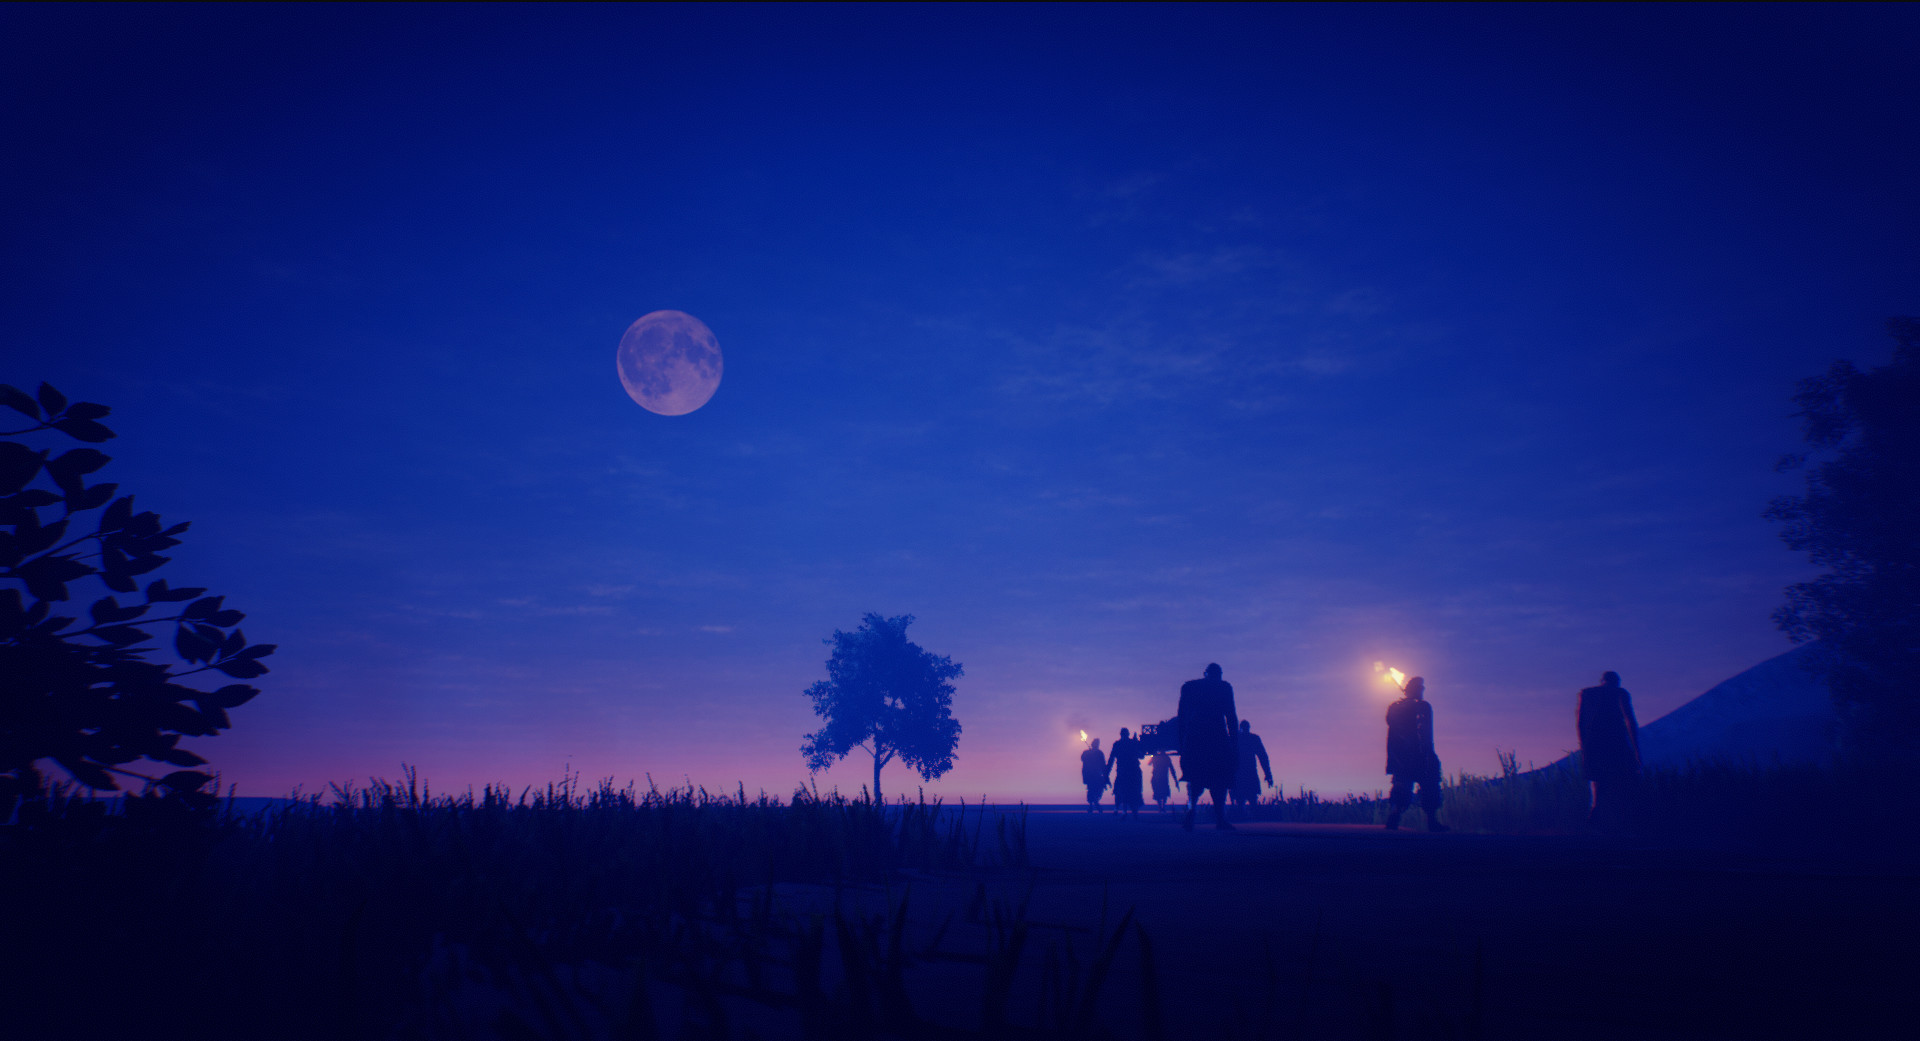 Funeral procession screenshot